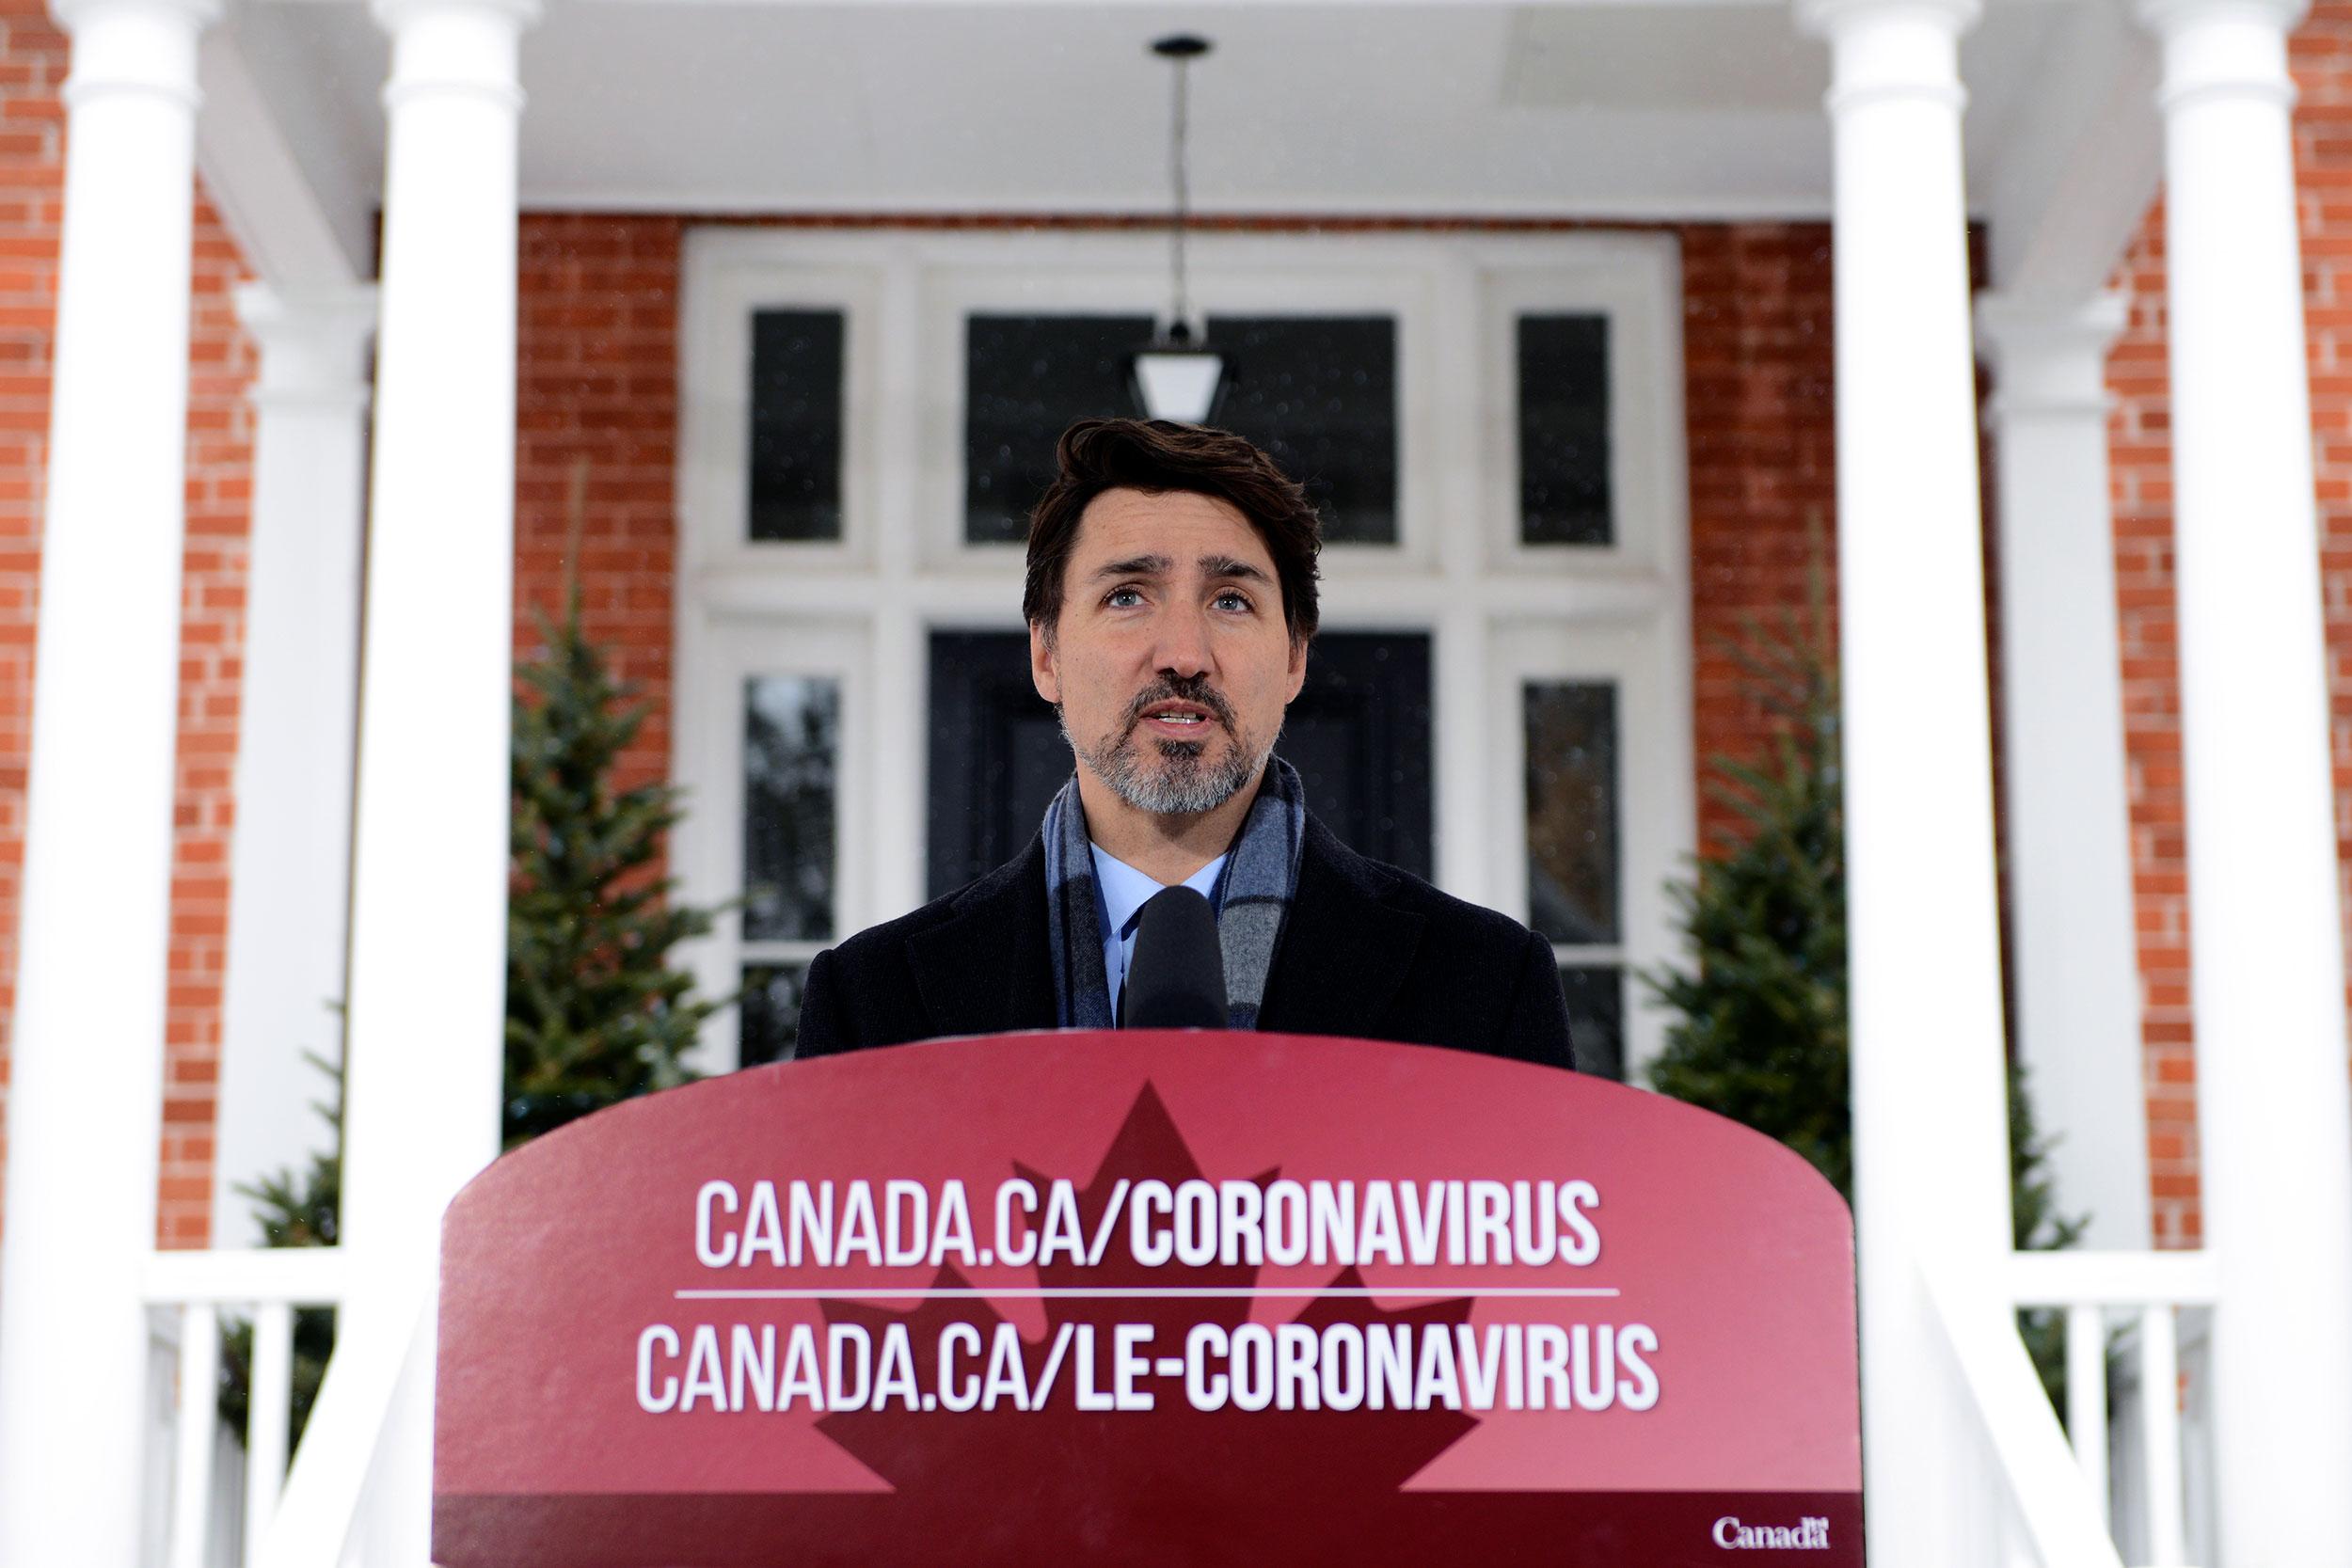 Sean Kilpatrick/The Canadian Press/AP